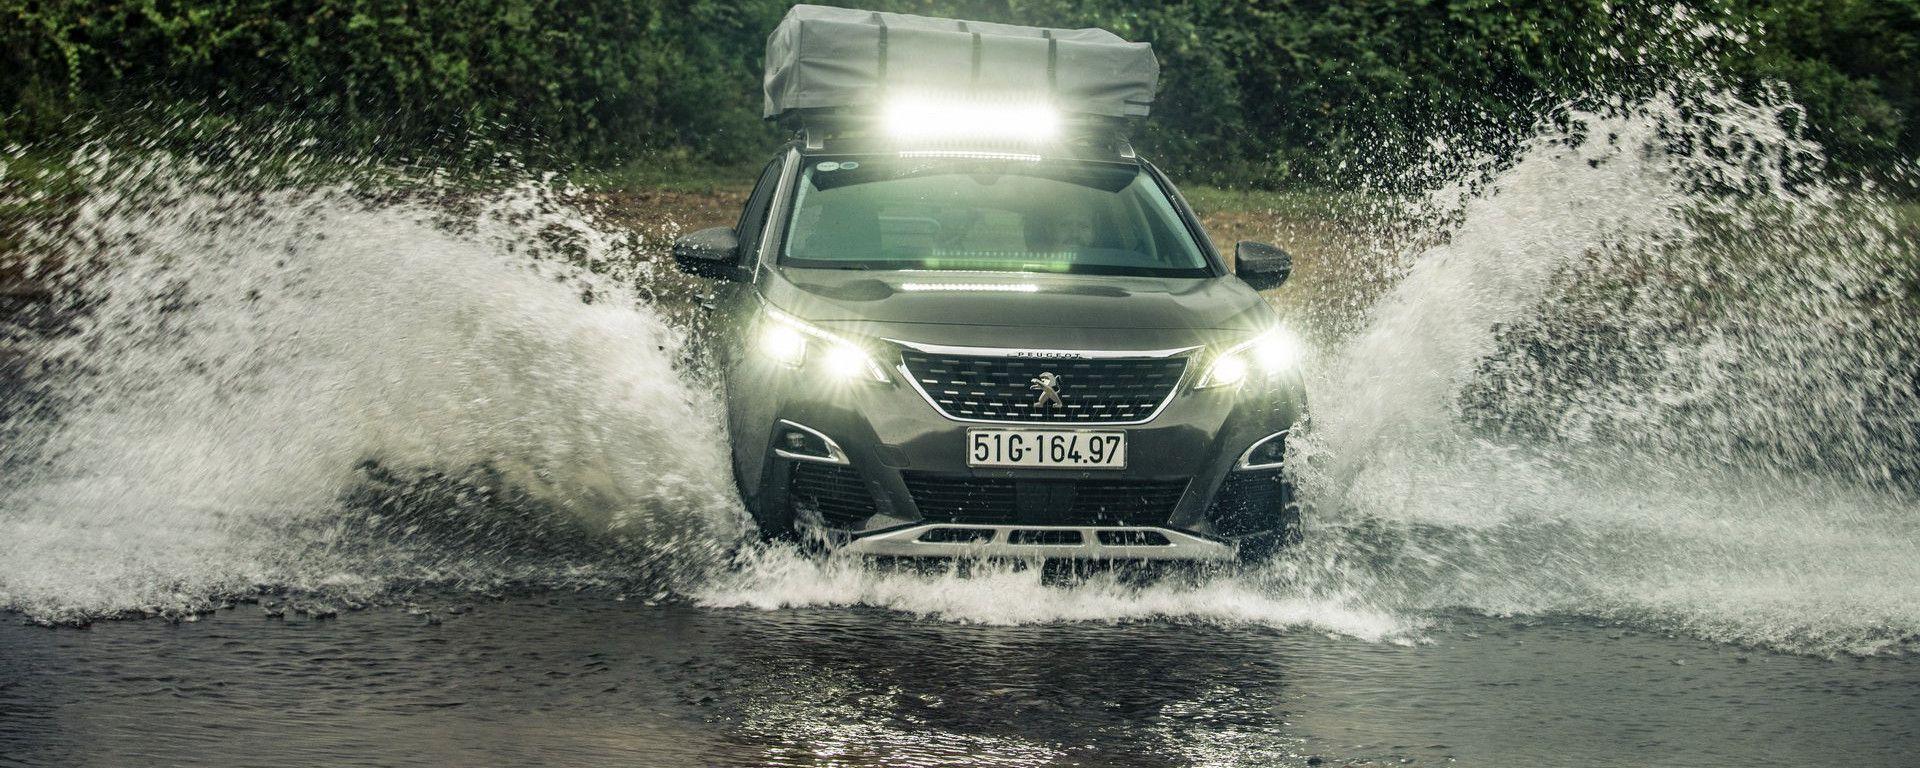 Peugeot 3008: allestimento off-road nel fiume